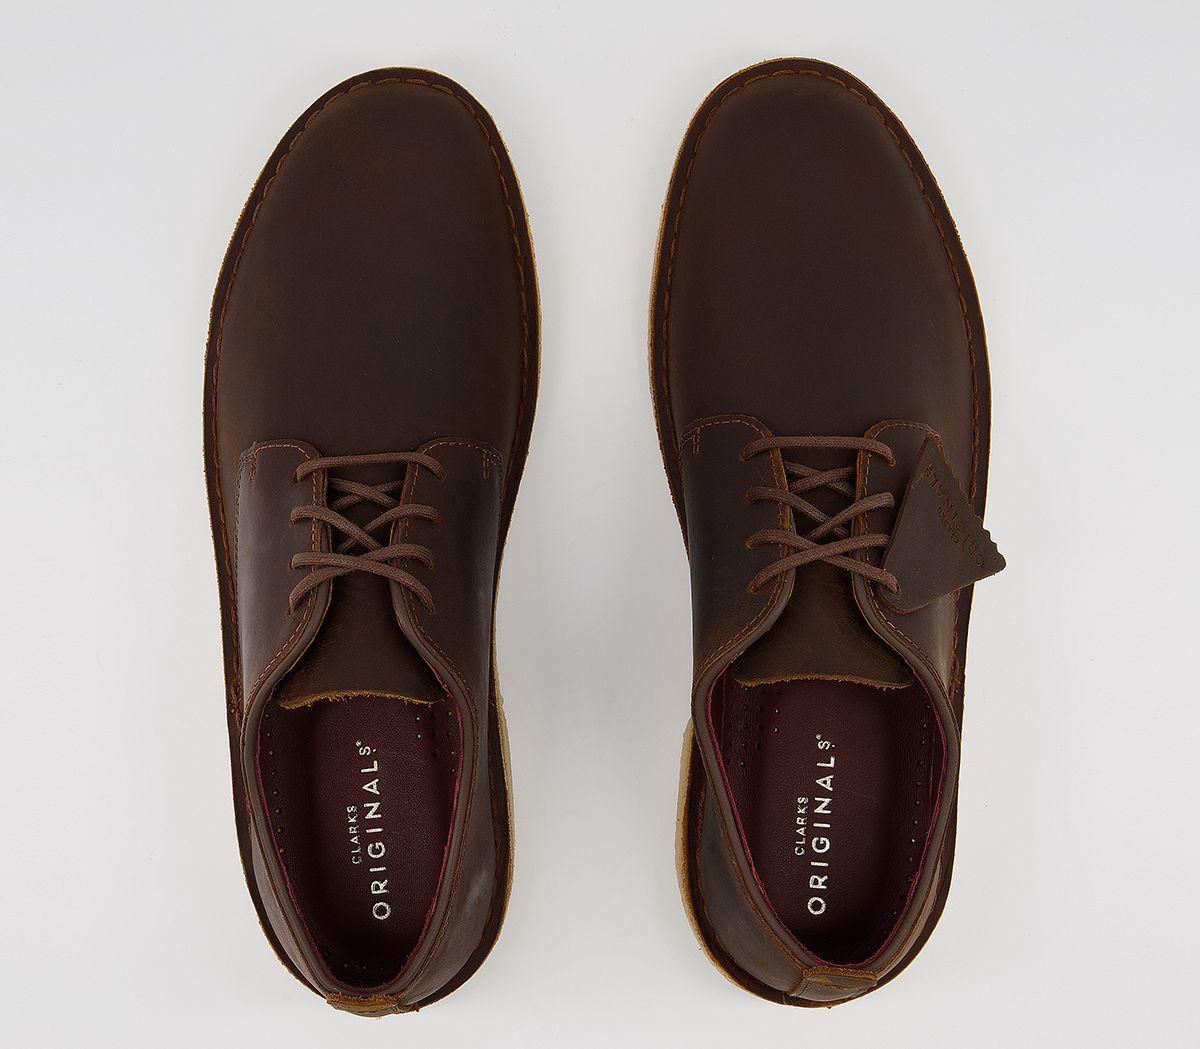 f1e806ed Hombre Clarks Originals Desierto Londres Zapatos Abeja Nuevo Zapatos ...